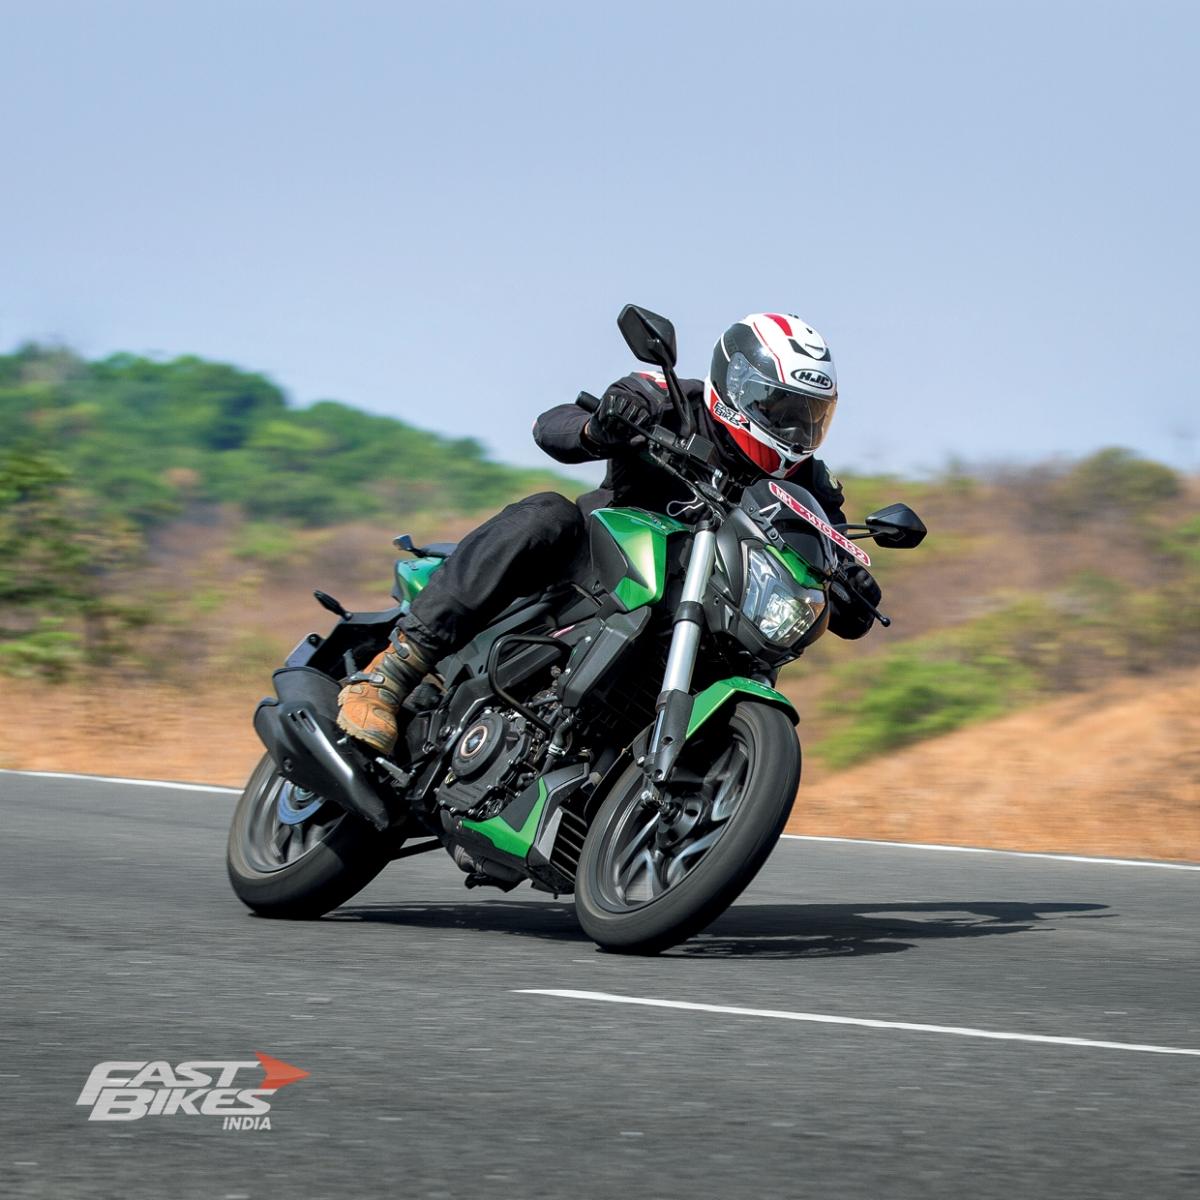 Comparo – KTM 250 Duke, RE Himalayan, Yamaha YZF R15, Bajaj Dominar